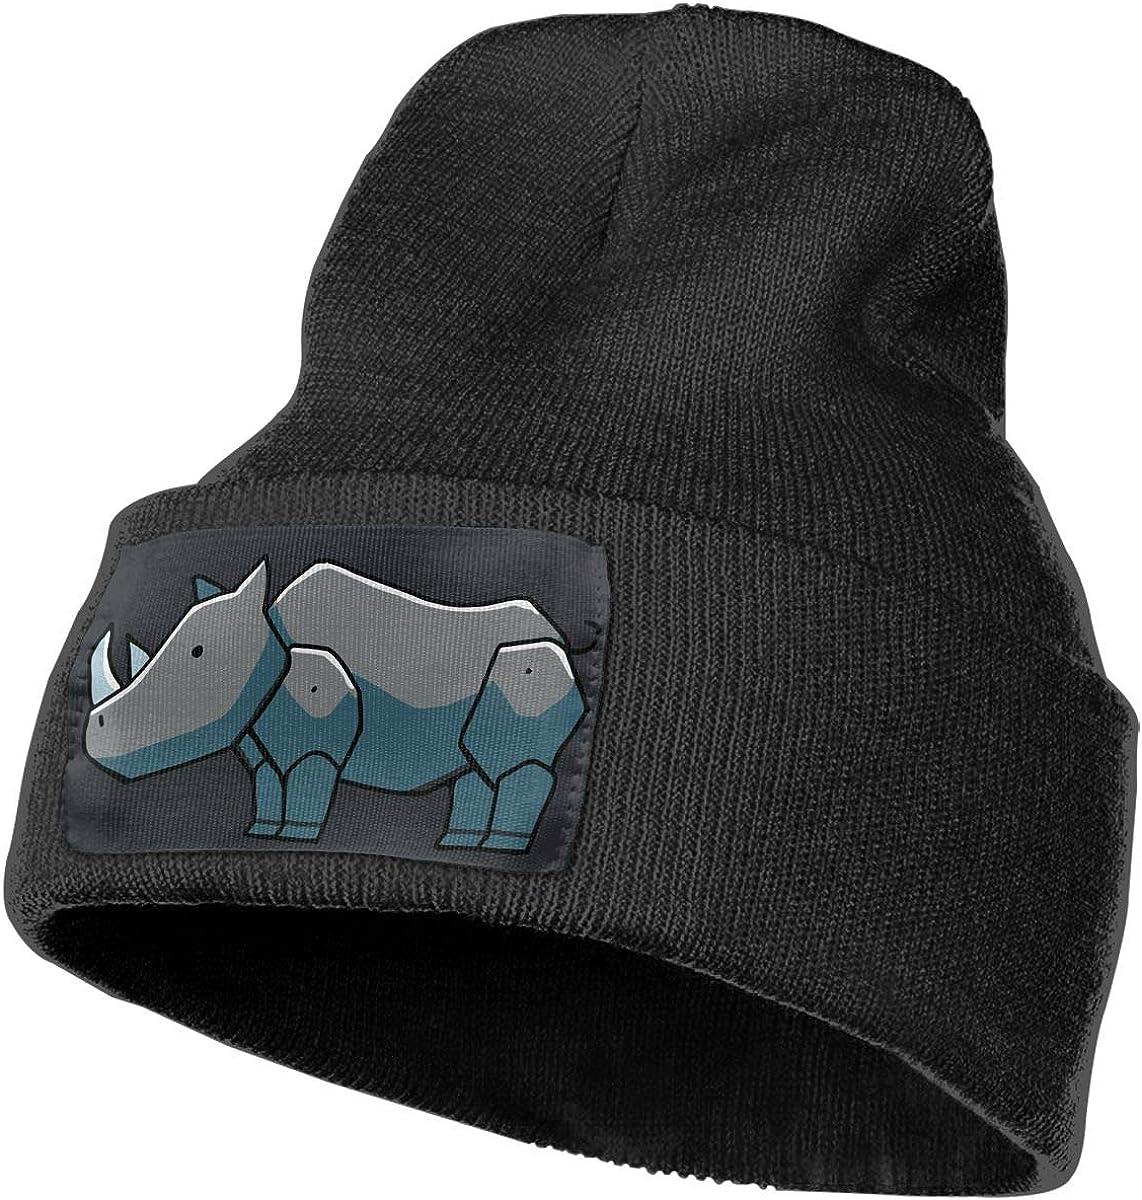 Rhinoceros Original Ski Cap Unisex 100/% Acrylic Knitting Hat Cap